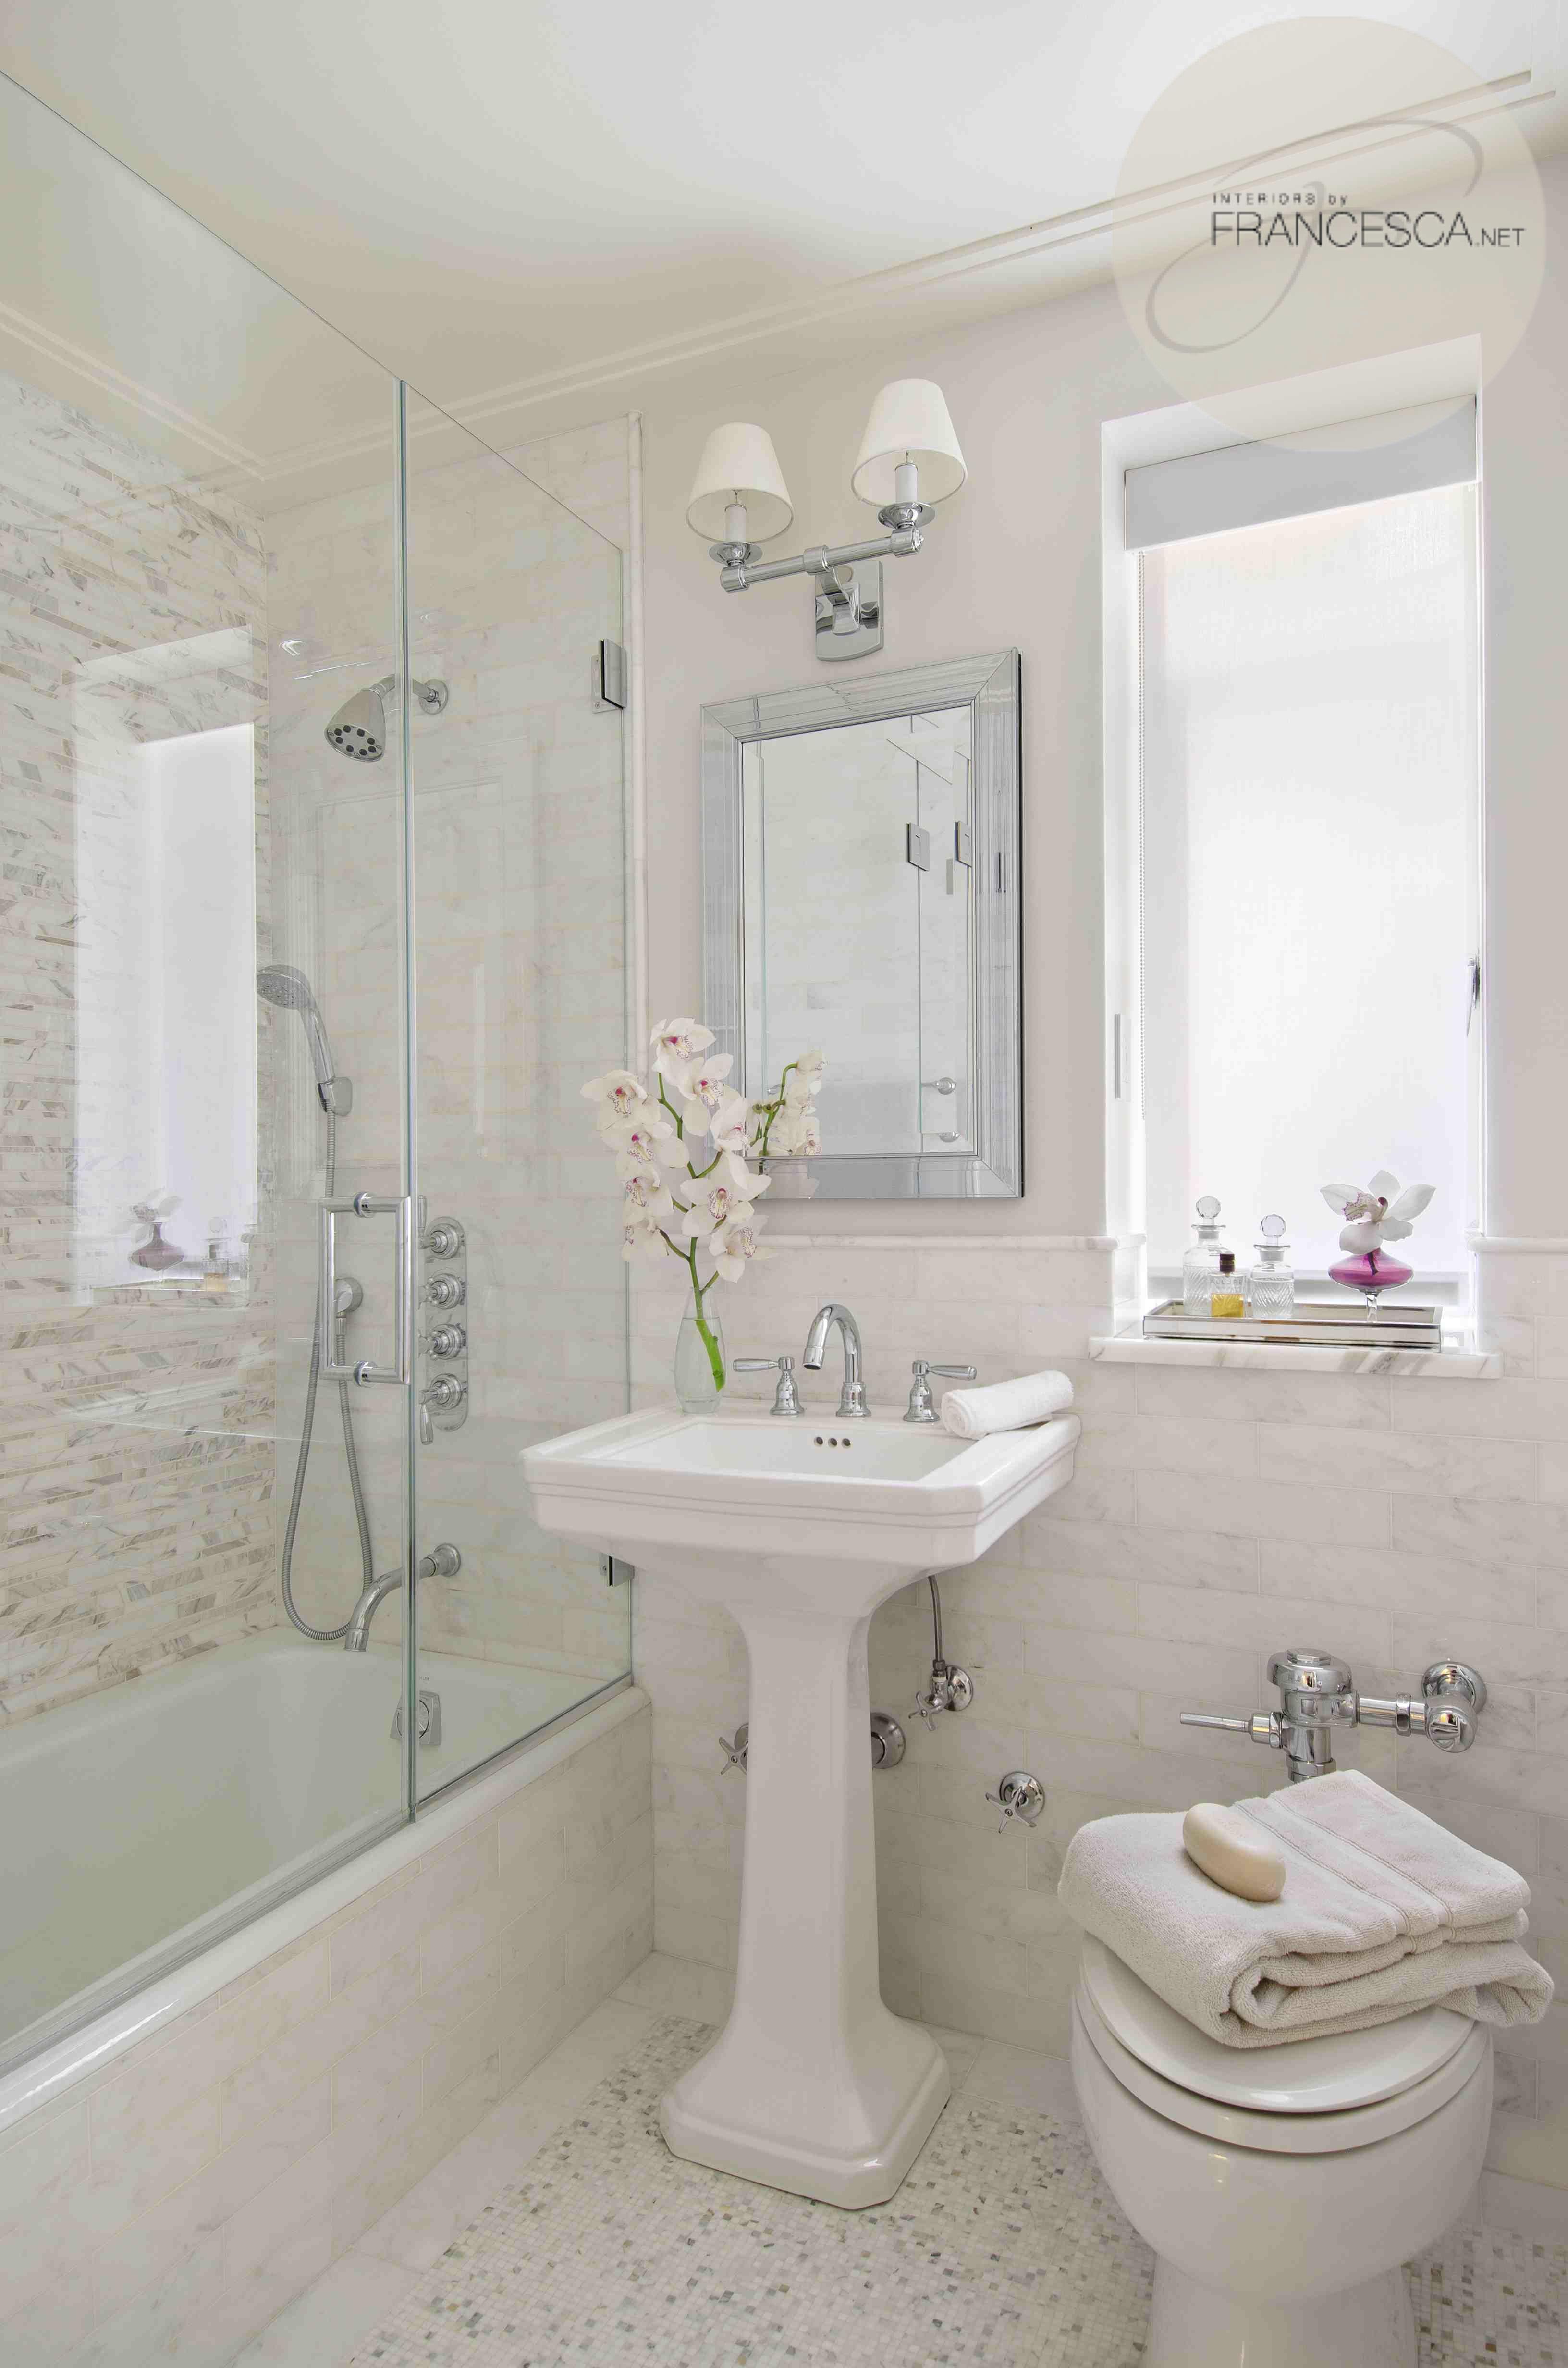 8 Ways To Make A Small Bathroom Look Big | Neutral, Bath and Kid ...